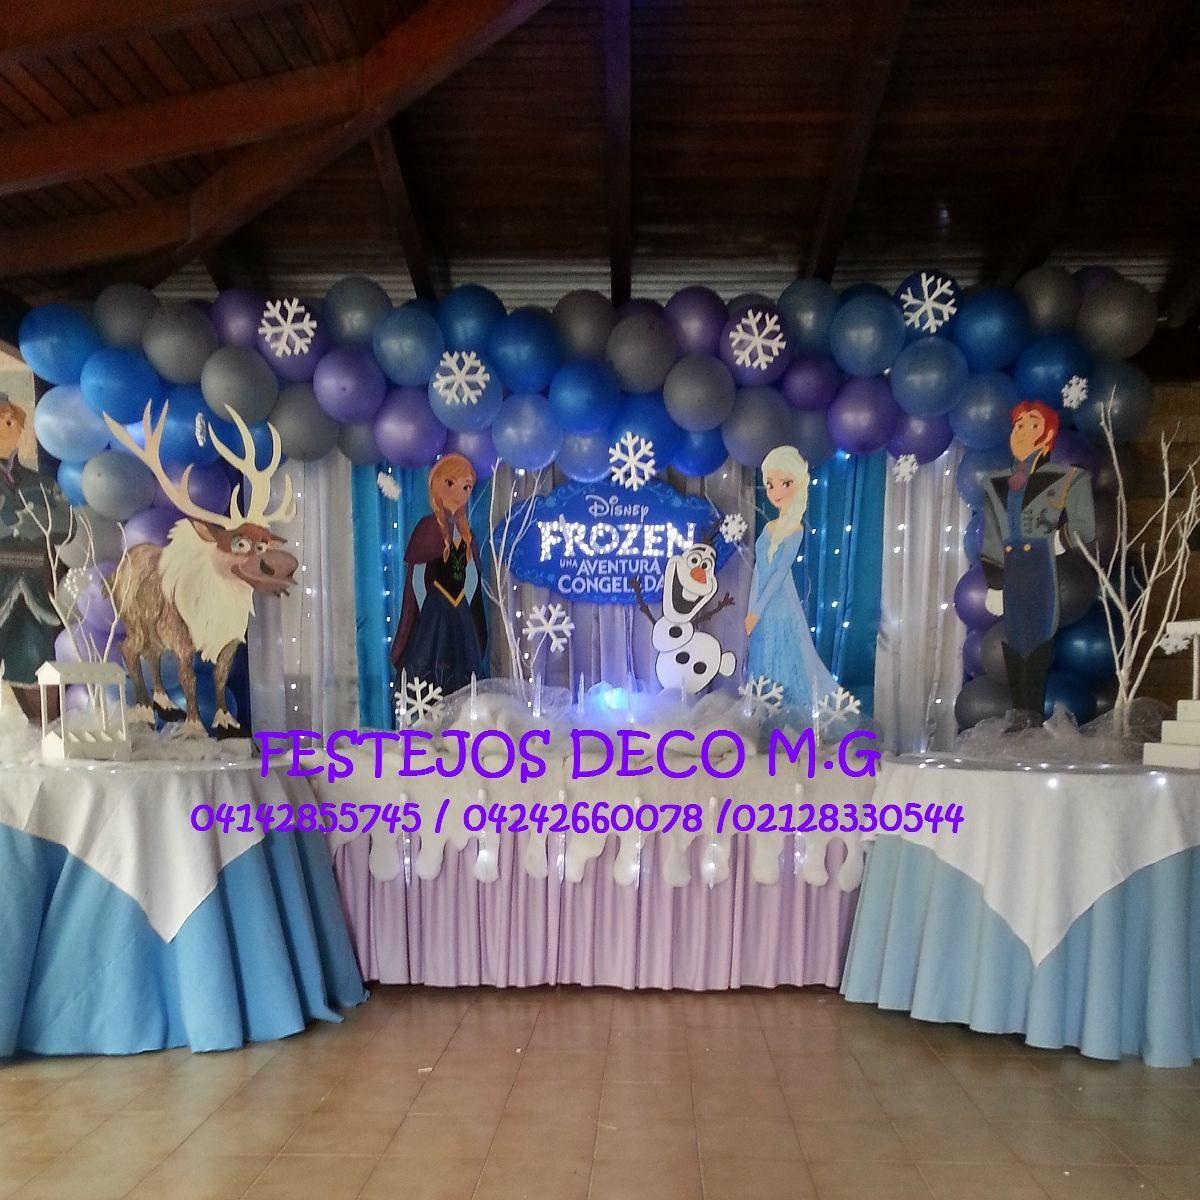 decoracion frozen buscar con google frozen pinterest ForBuscar Decoraciones